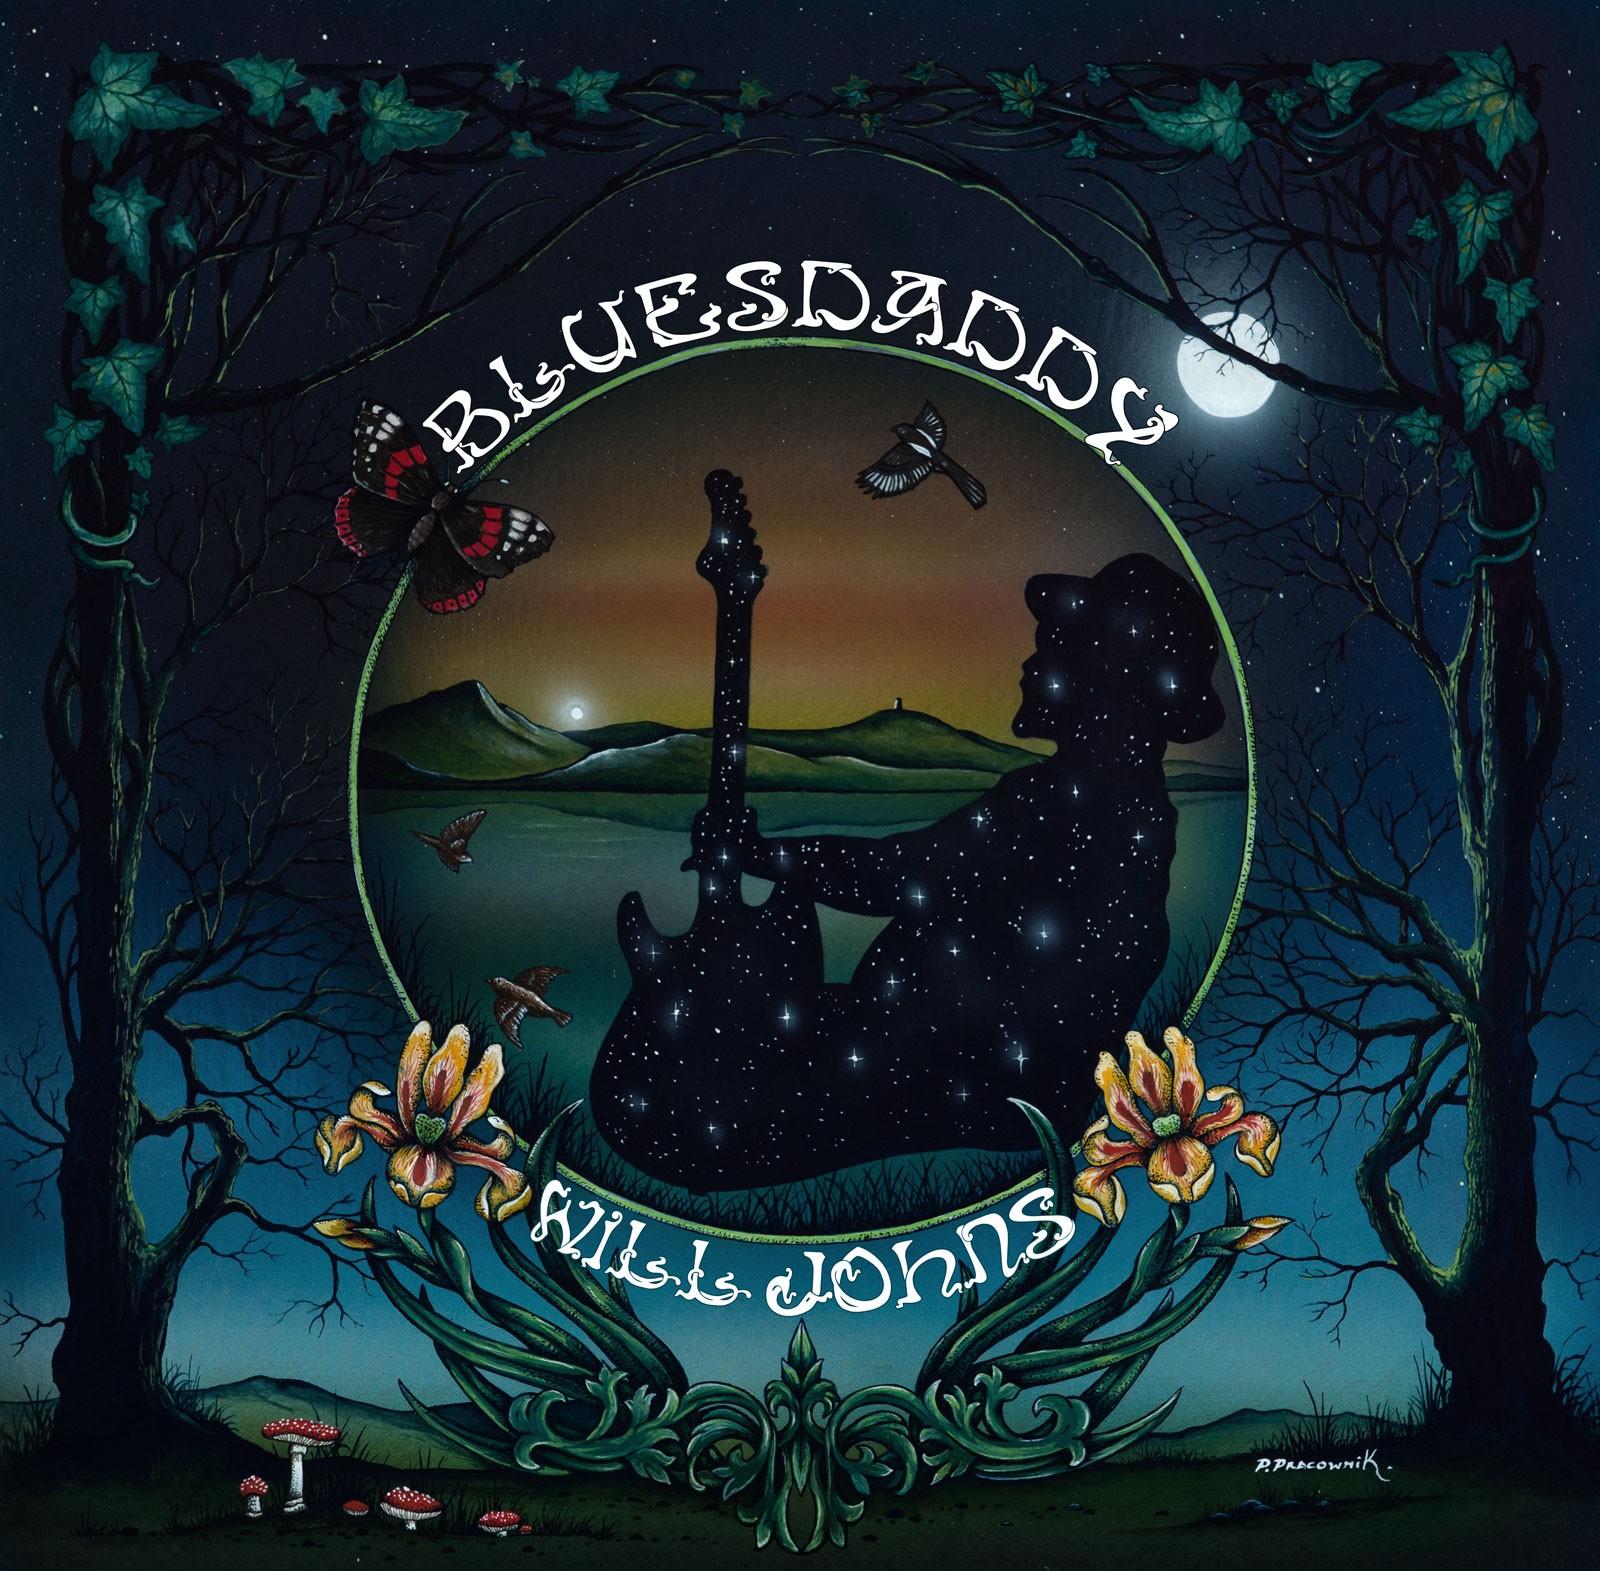 Will Johns - Bluesdaddy